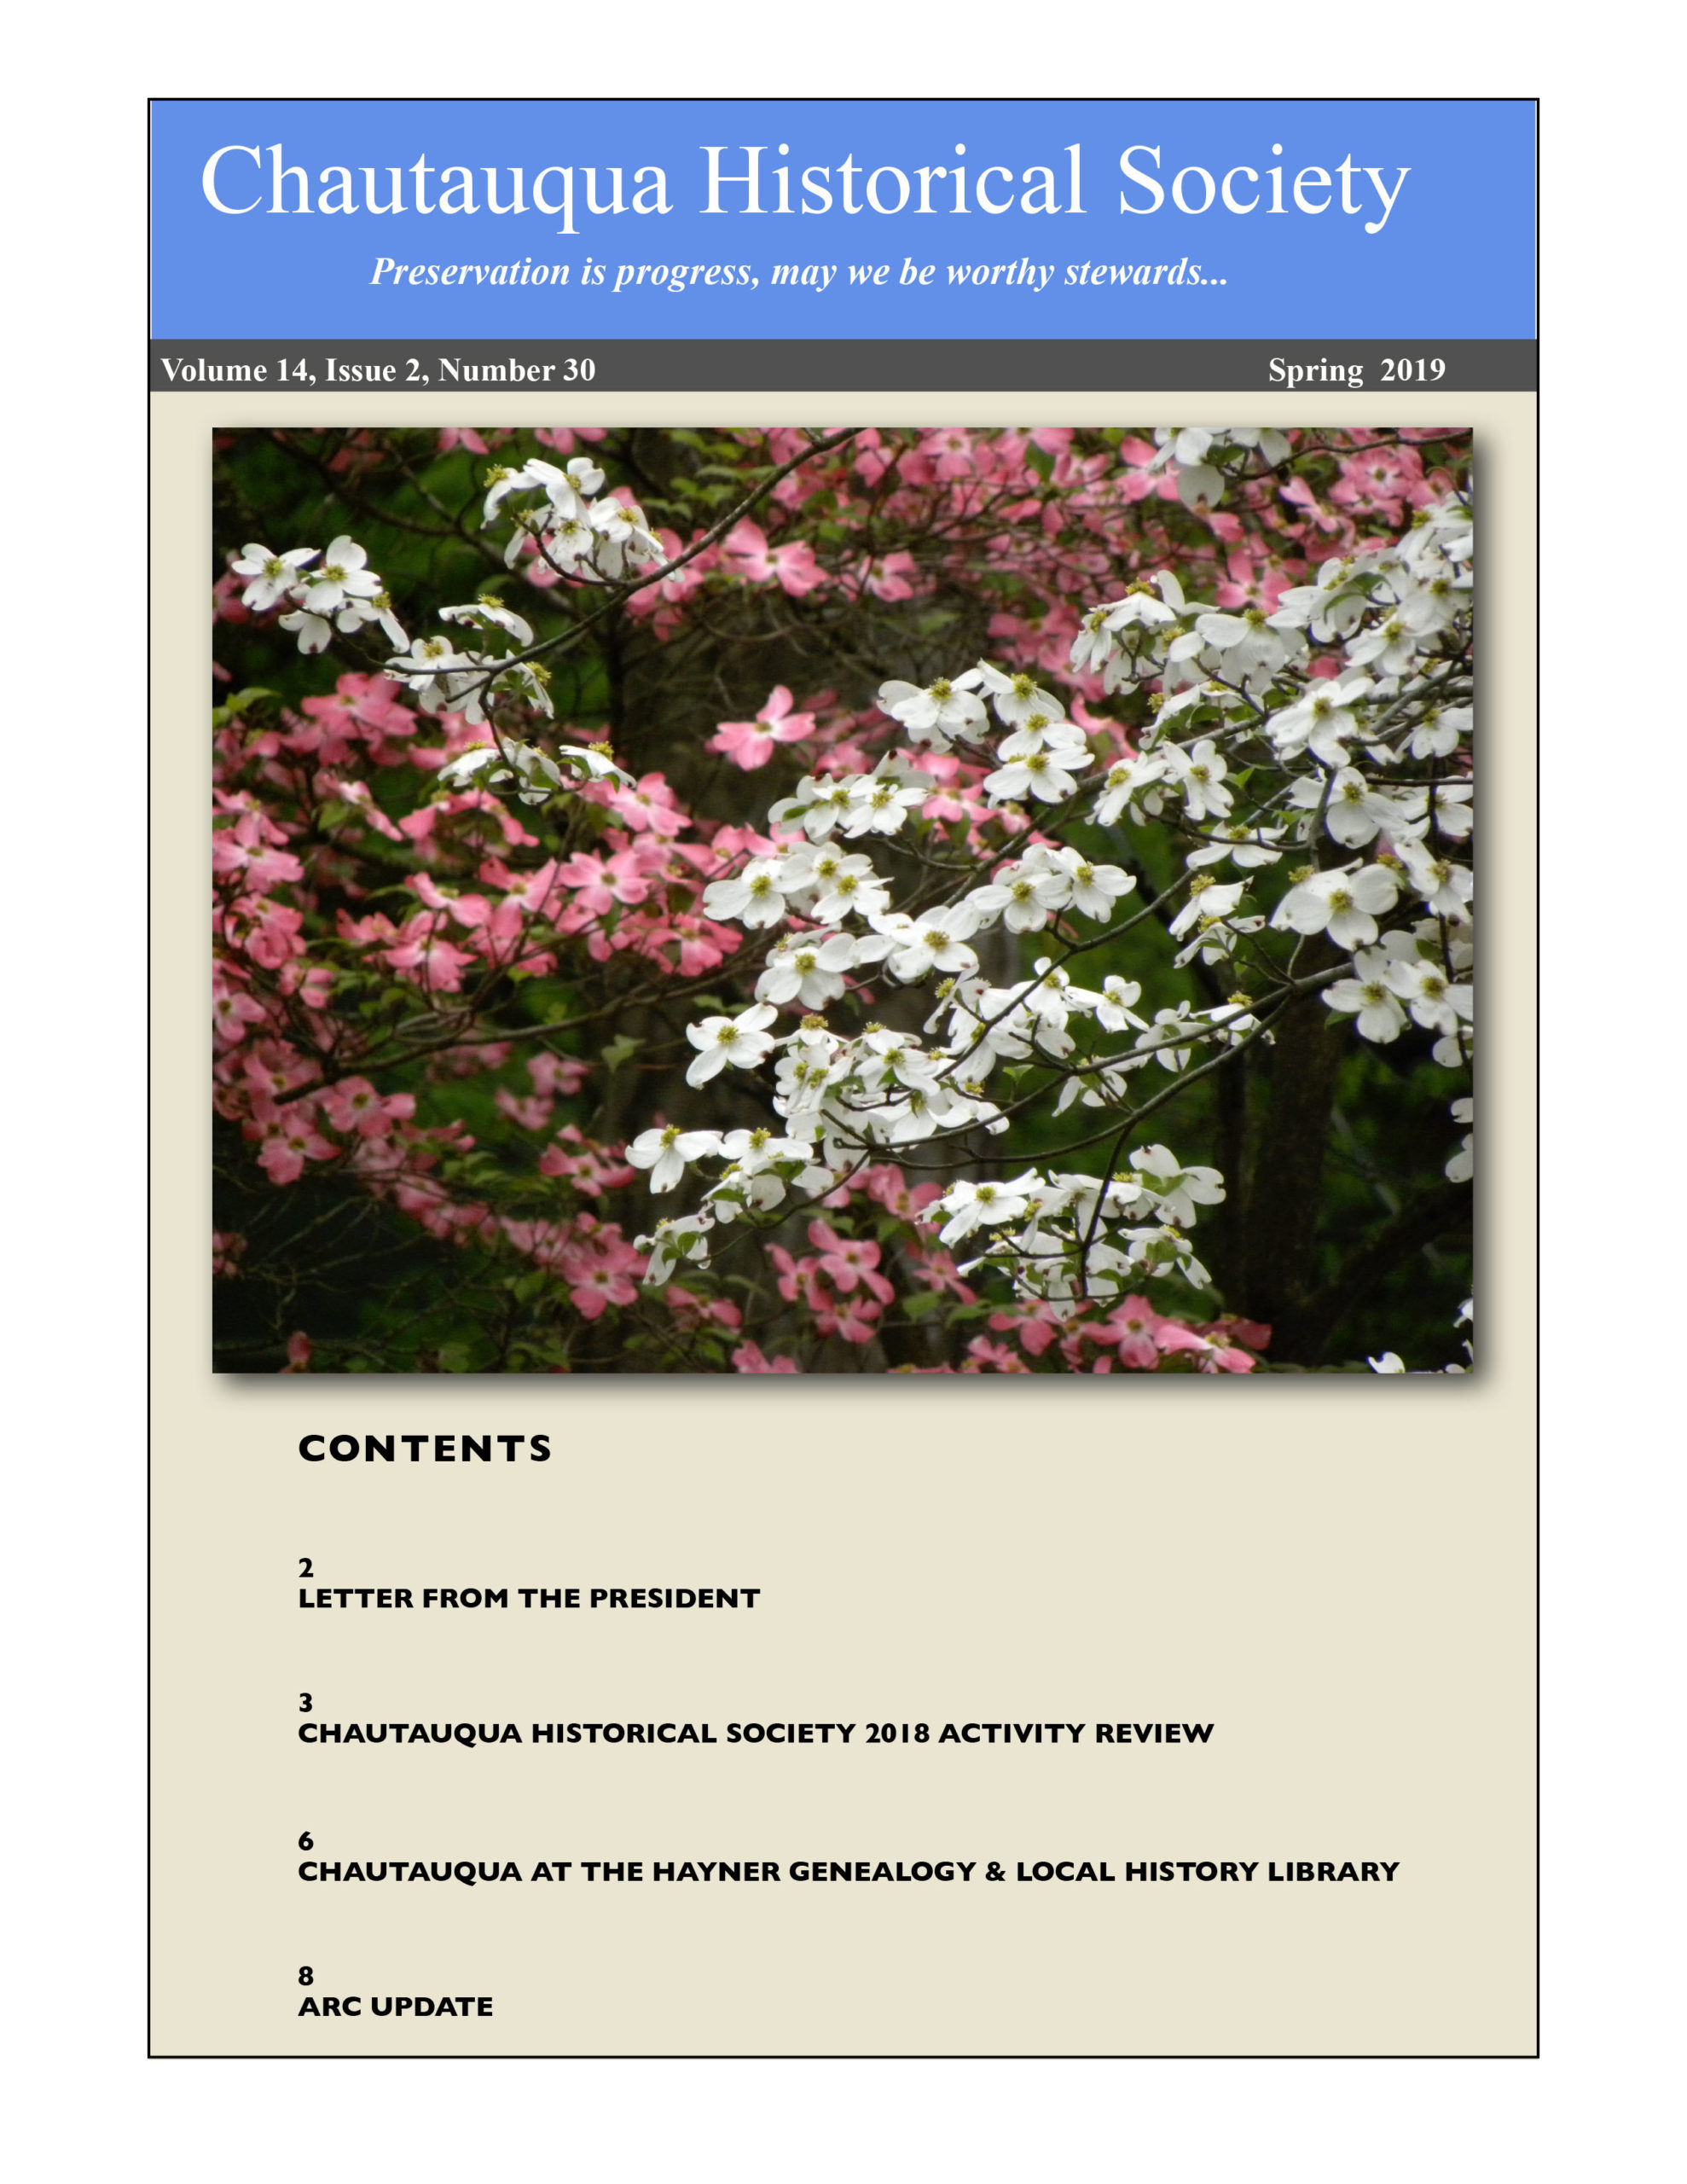 CHS Newsletter Spring 2019